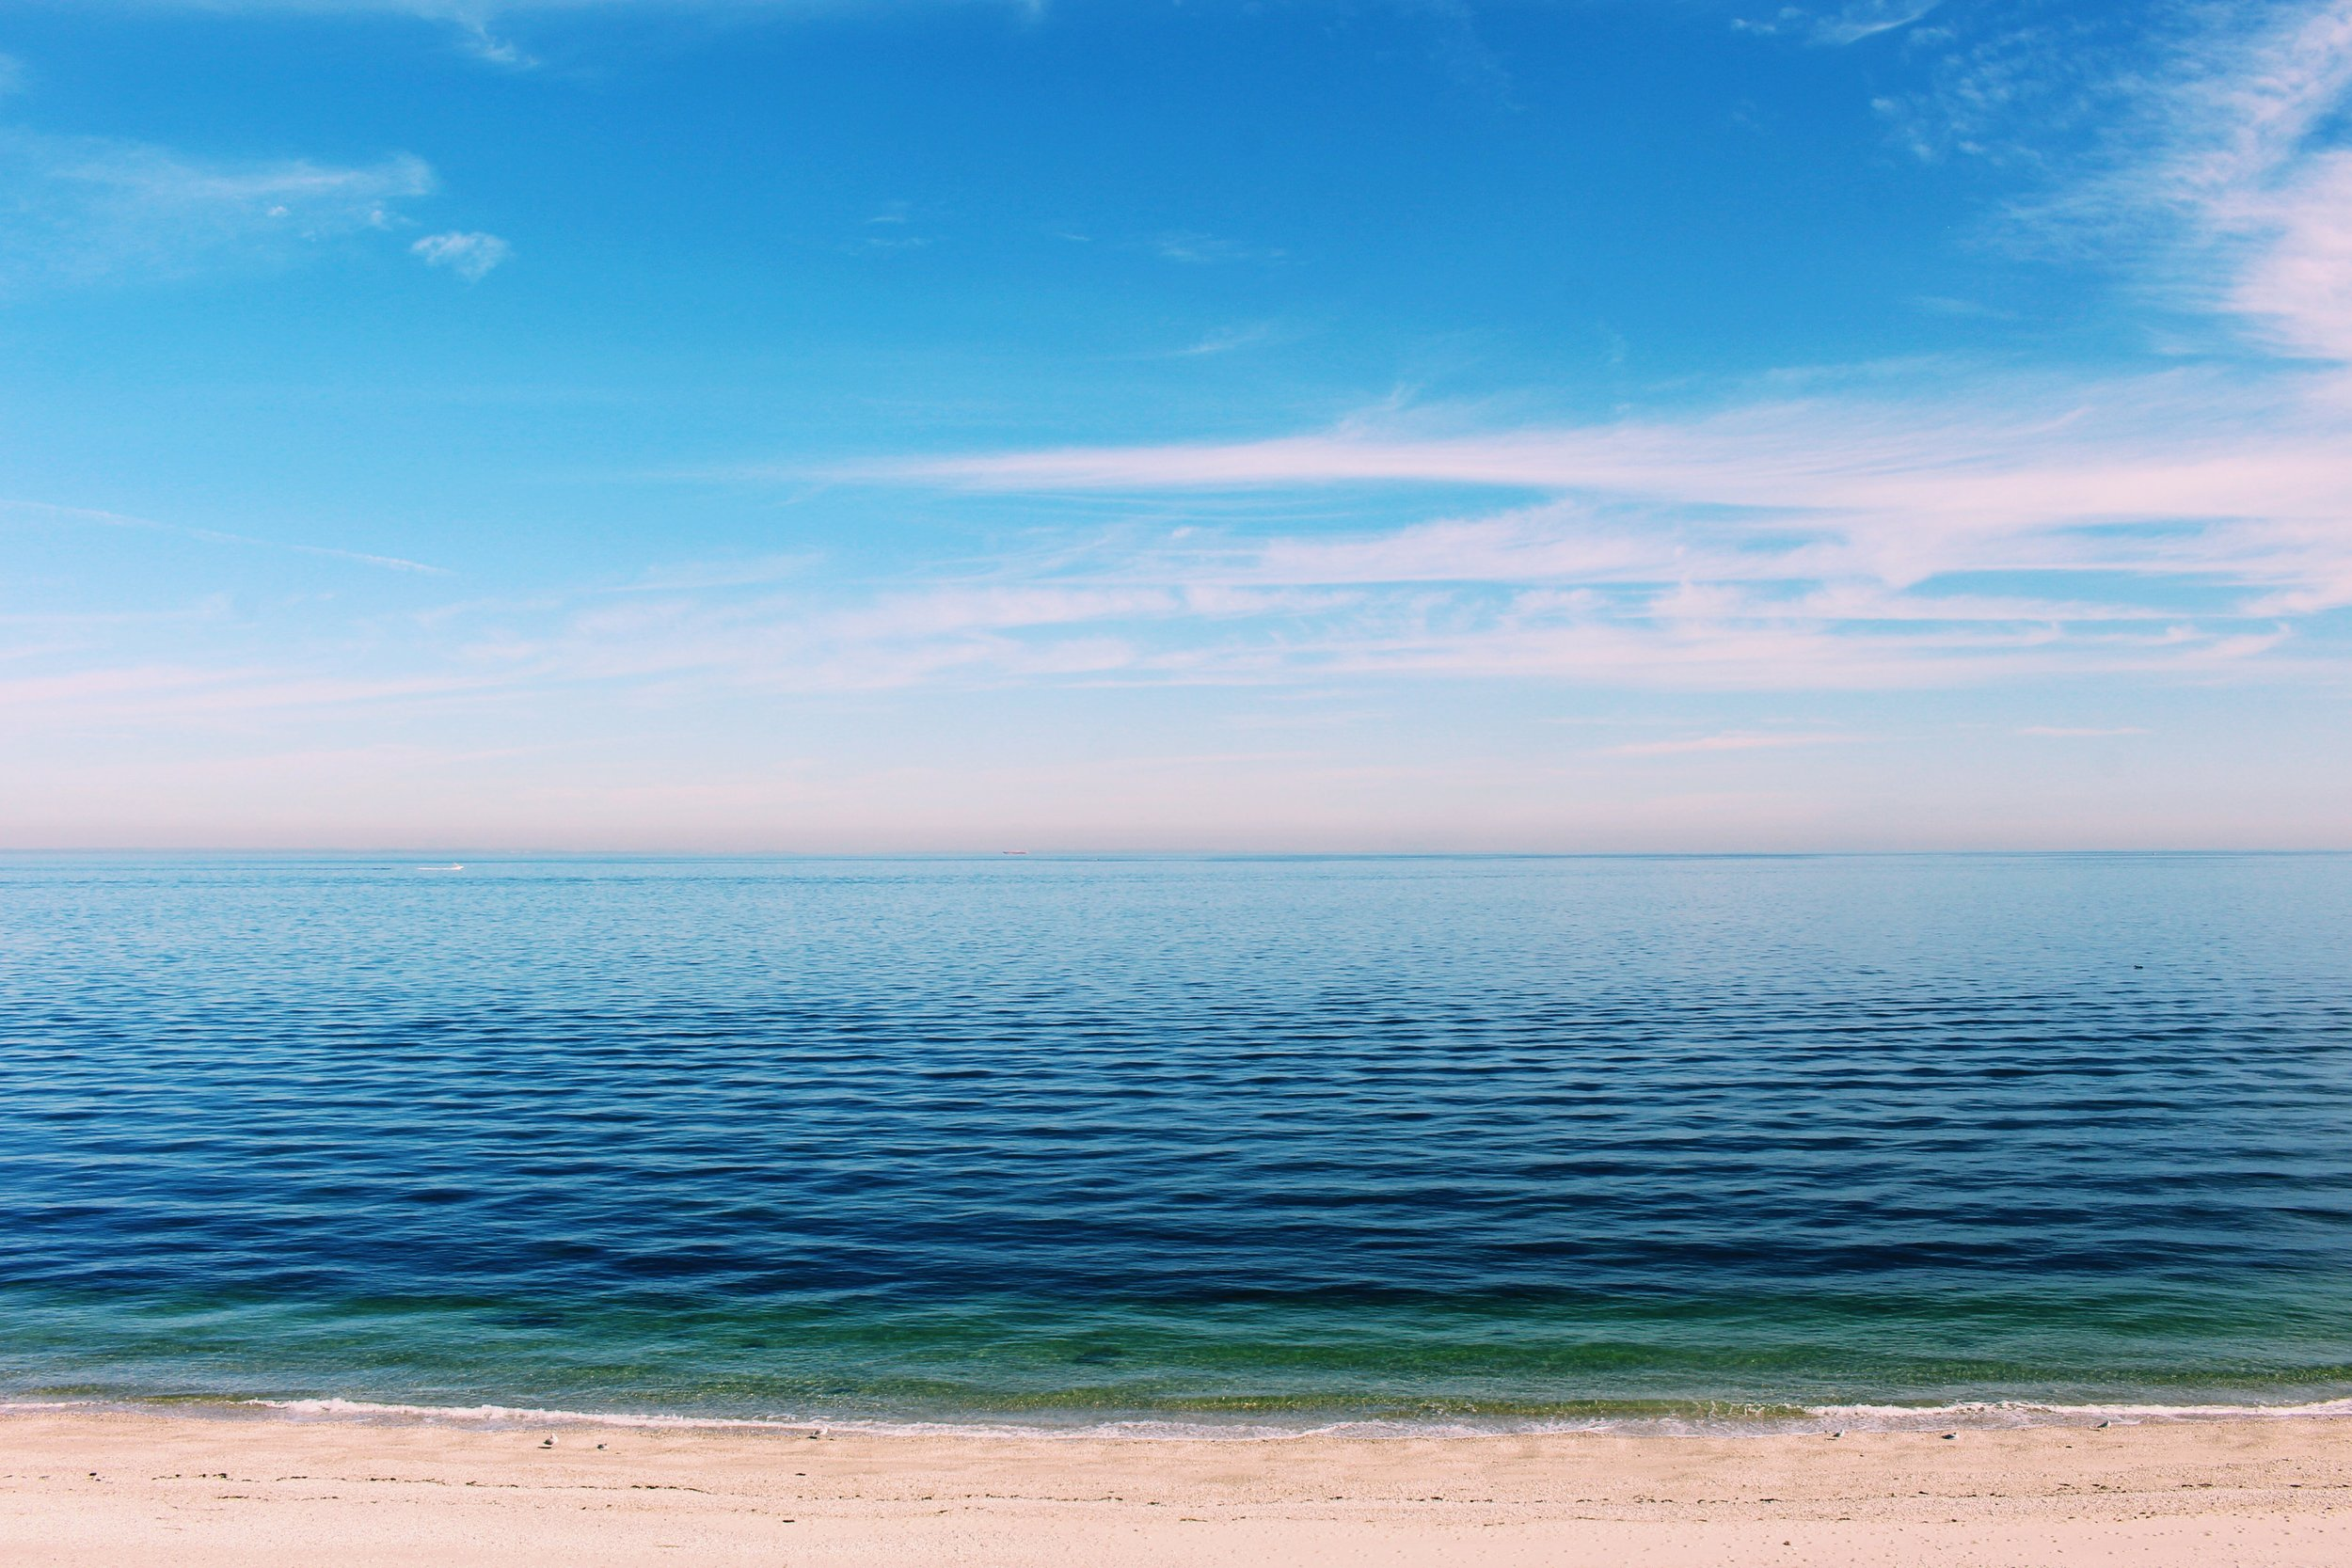 Long Island Sound (Pirate's Cove, Port Jeff)